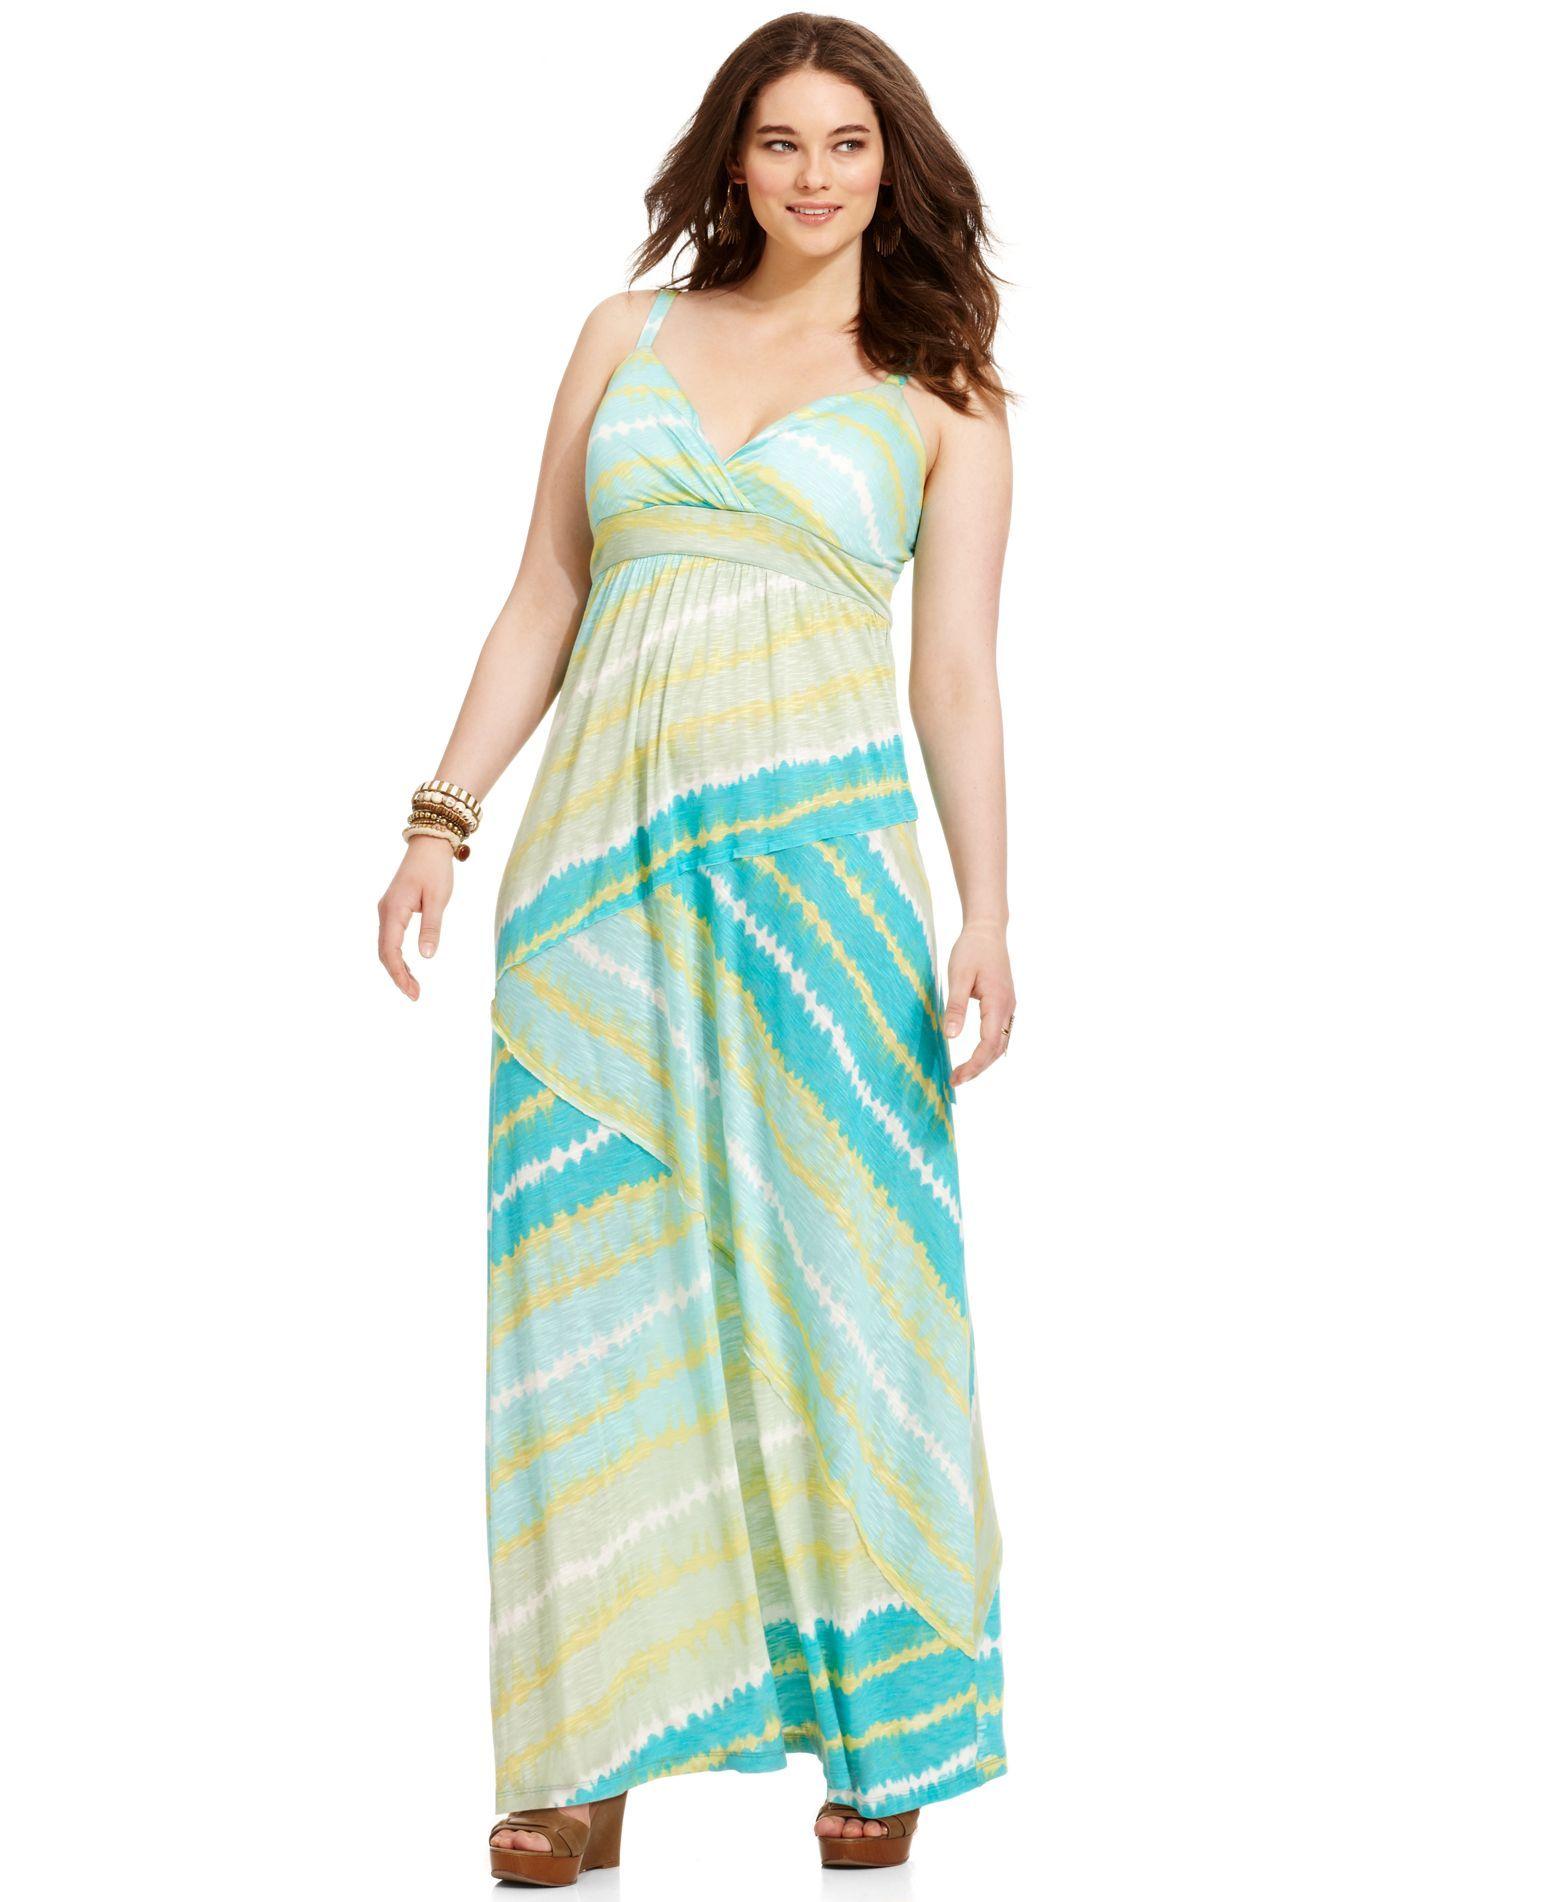 american rag plus size dress, sleeveless tie-dye maxi   products